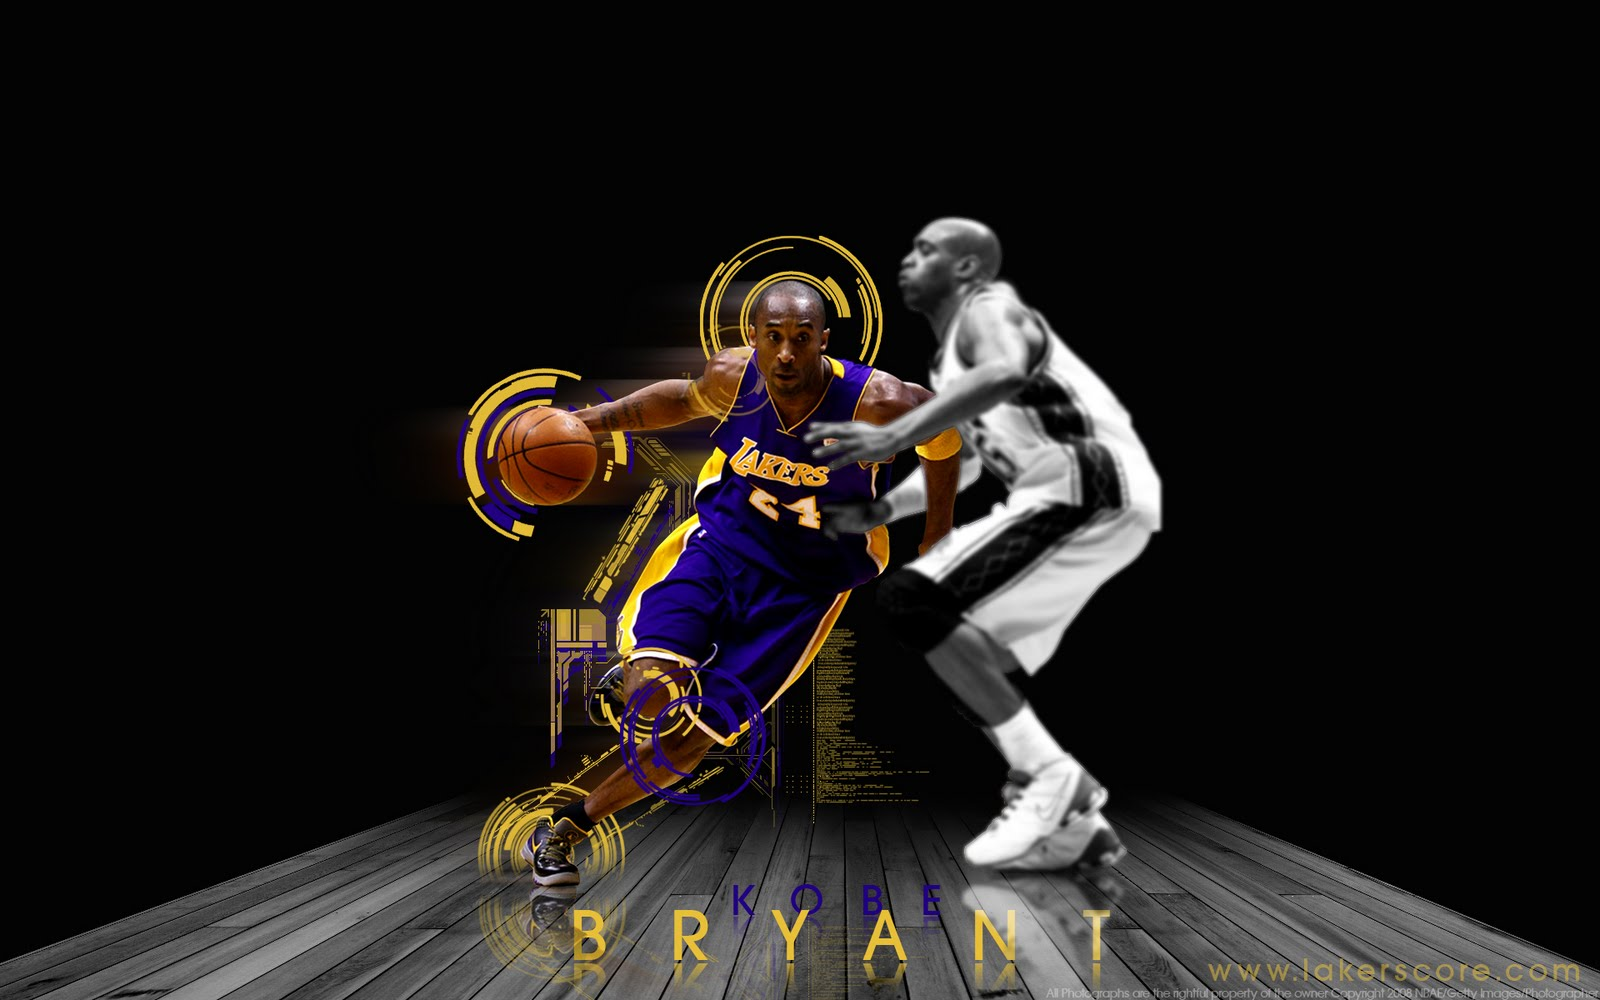 Best Kobe Bryant Wallpapers: Kobe Bryant Blog: Wallpapers